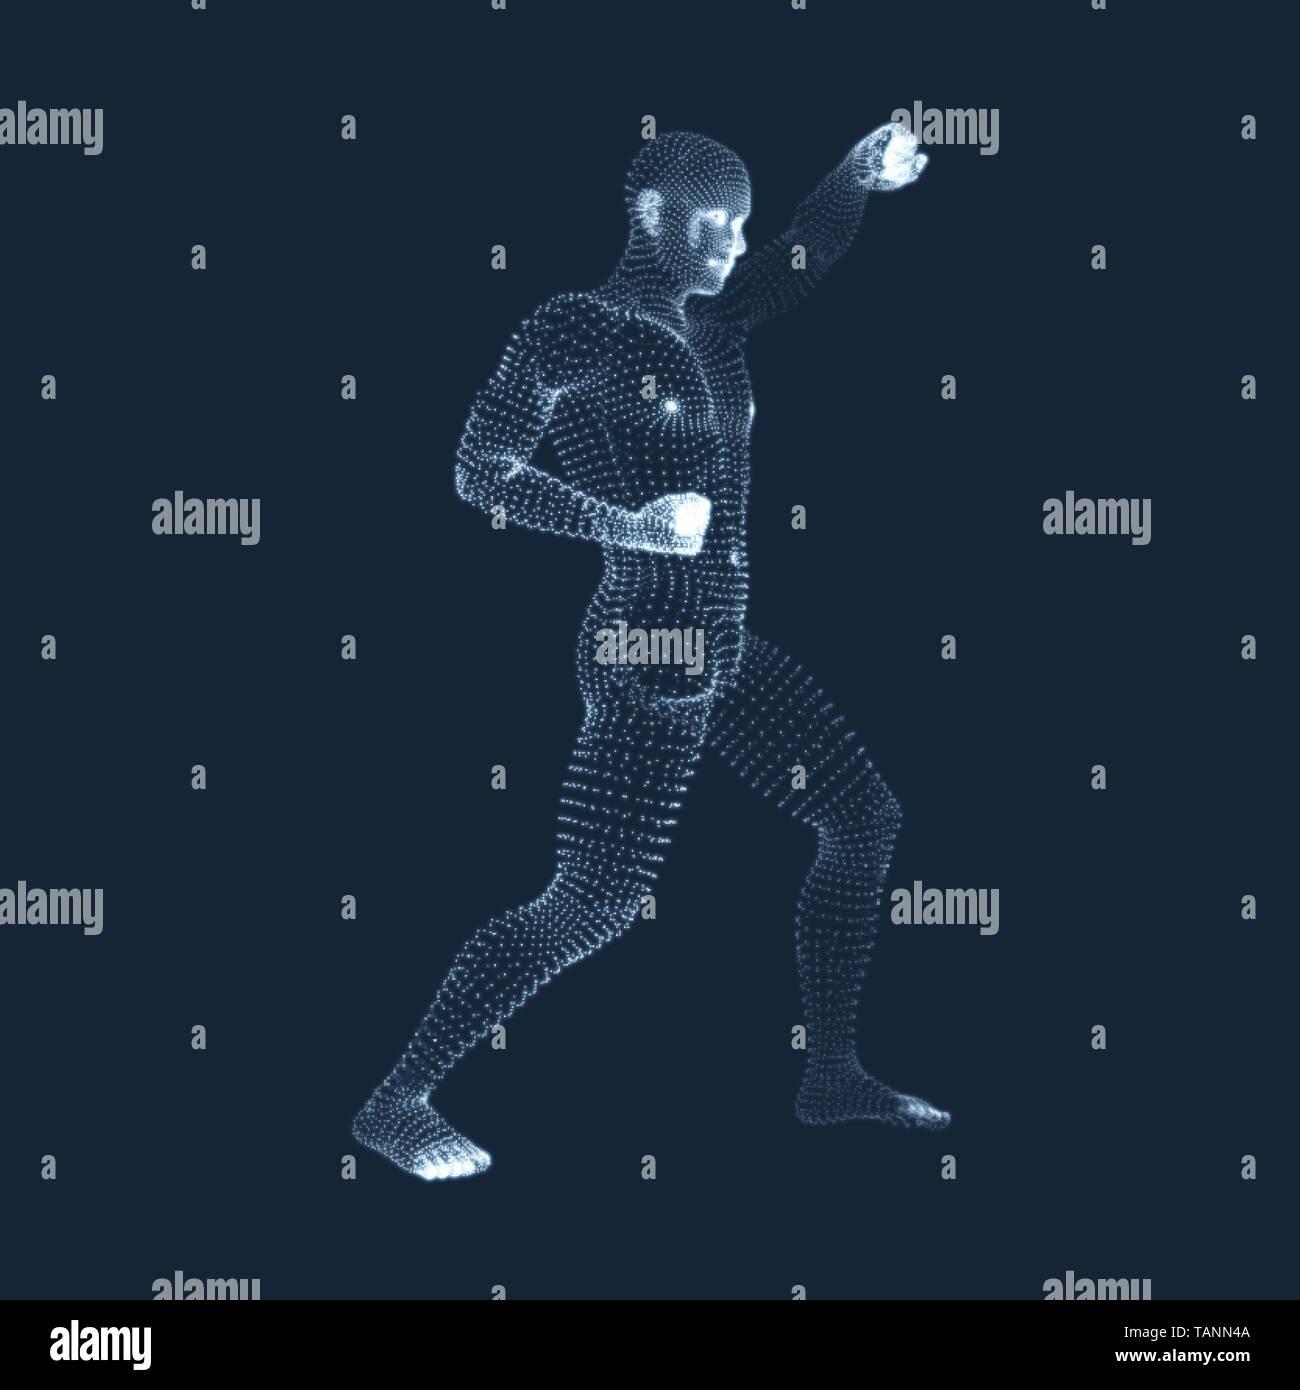 Fighting Man  3D Model of Man  Human Body Model  Body